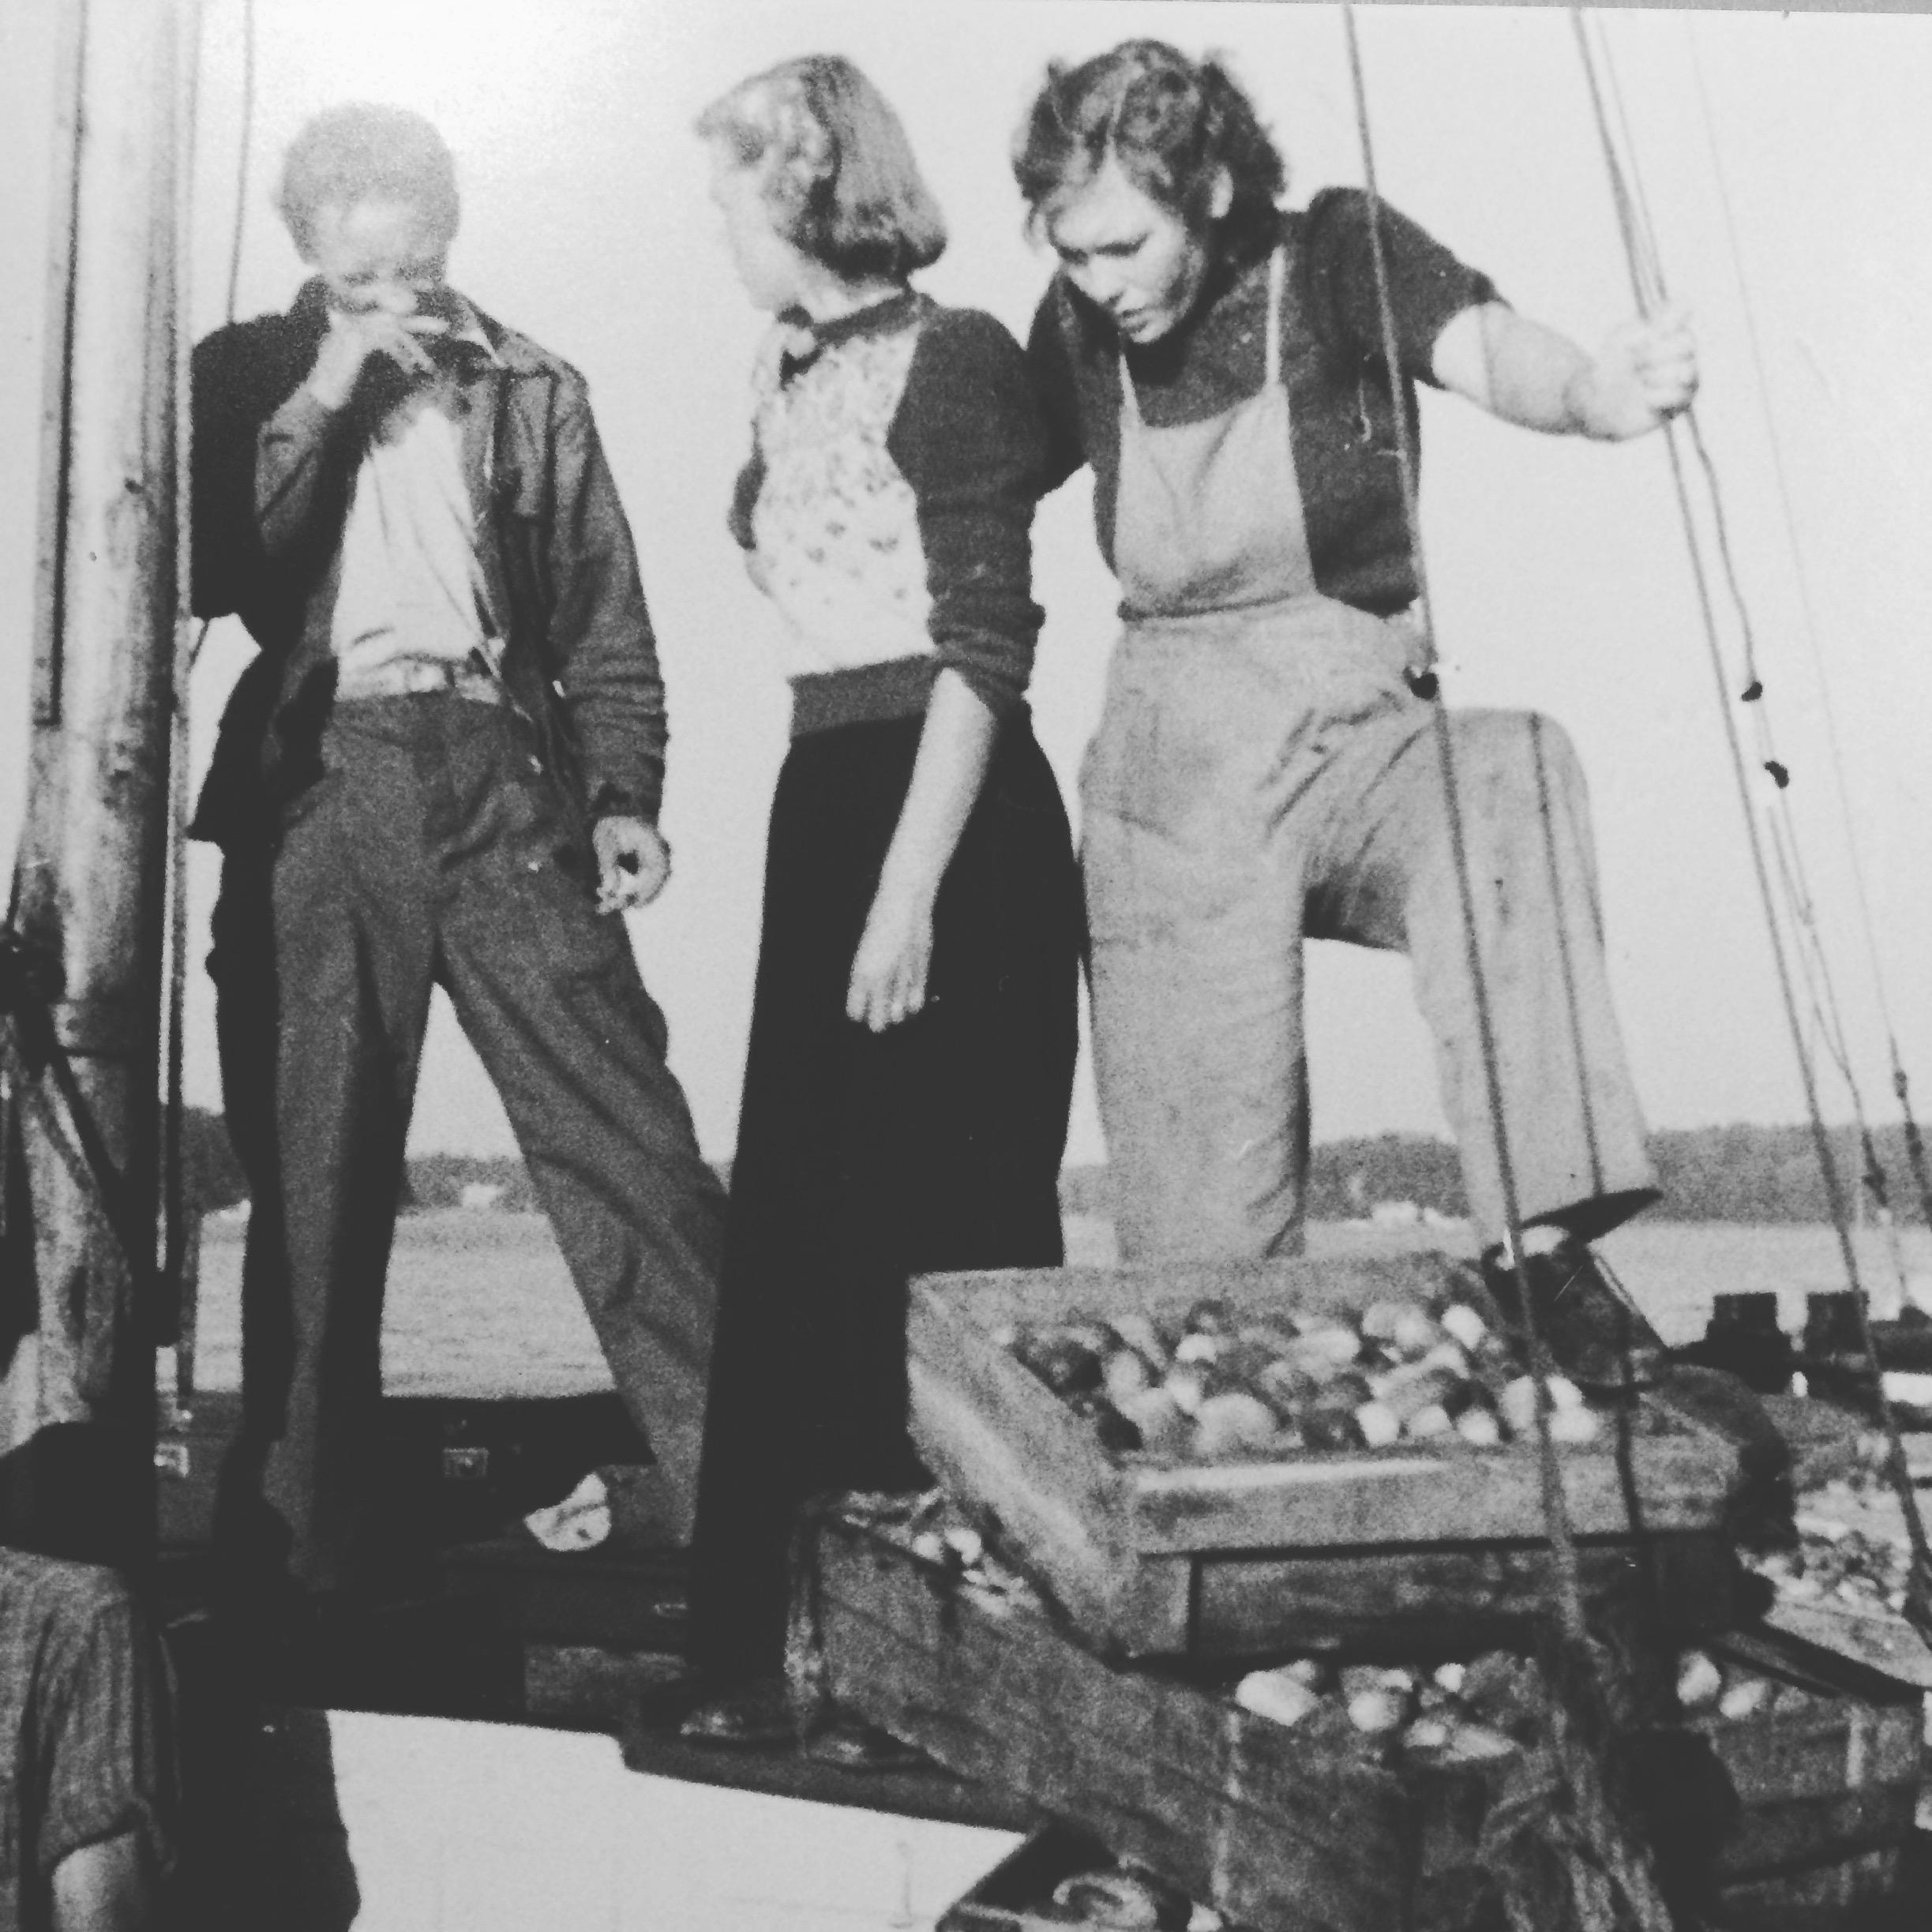 Women on boat (dungarees).jpg